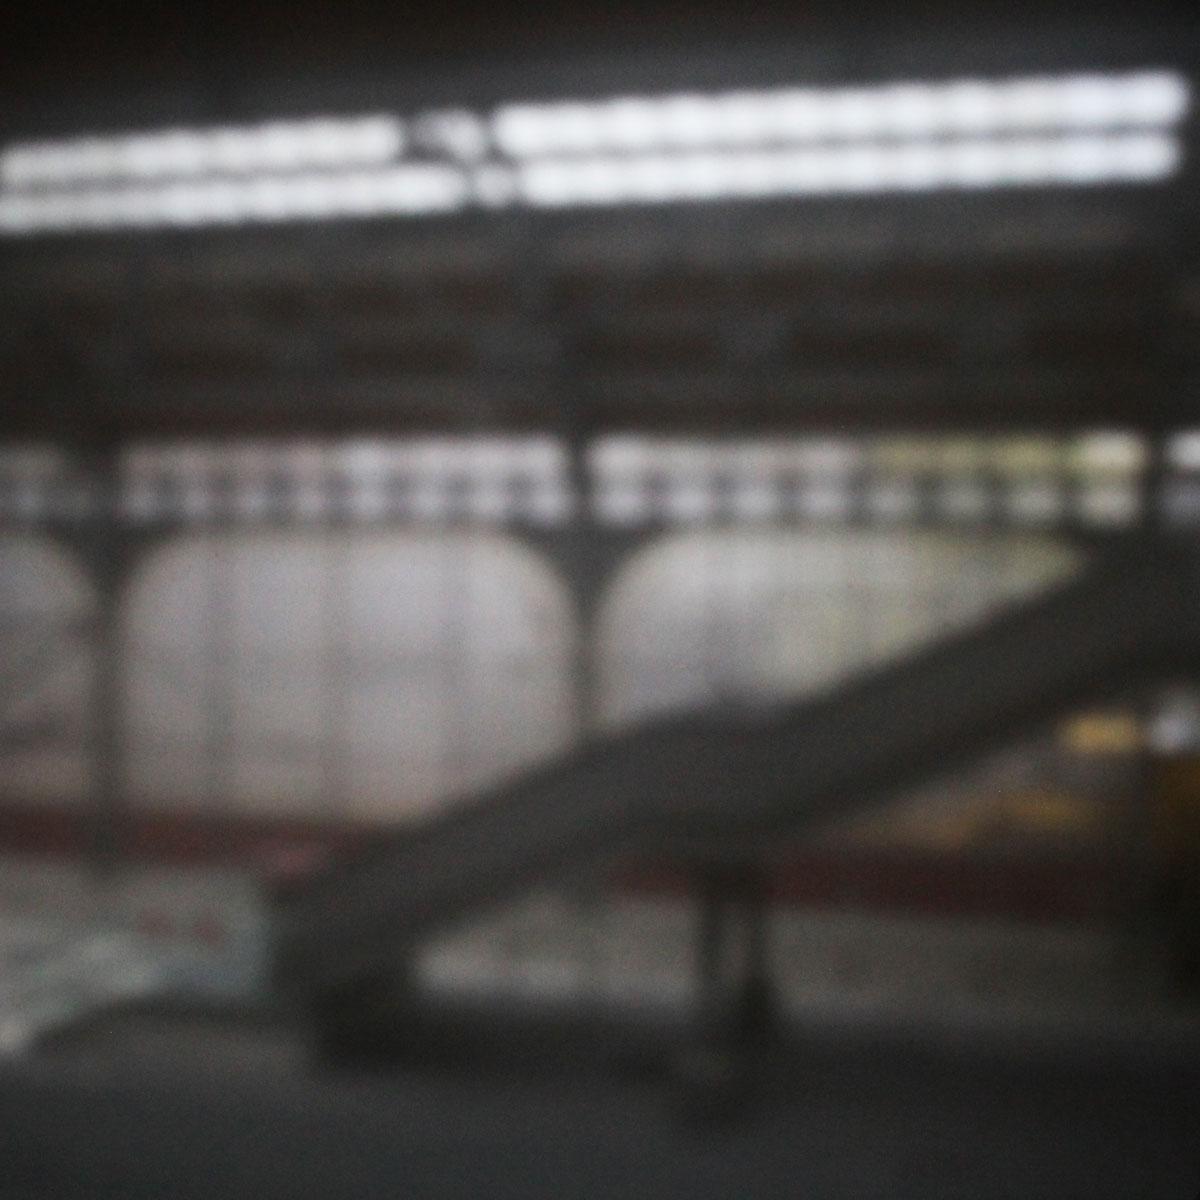 02 | Bahnhof Lübeck | 2021 | Camera Obscura | Pigmentdruck Alu-Dibond